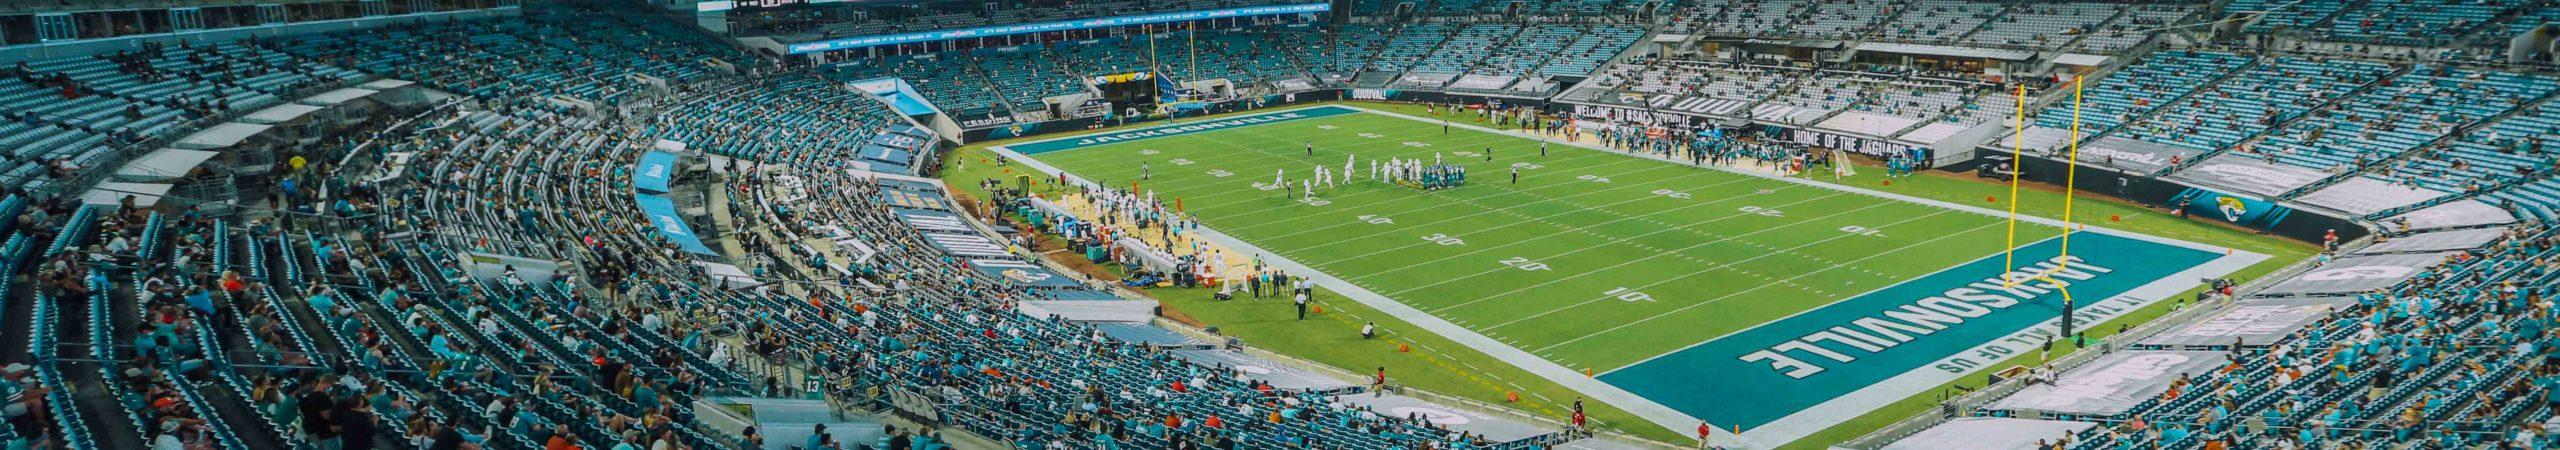 Jaguars vs Dolphins 2020